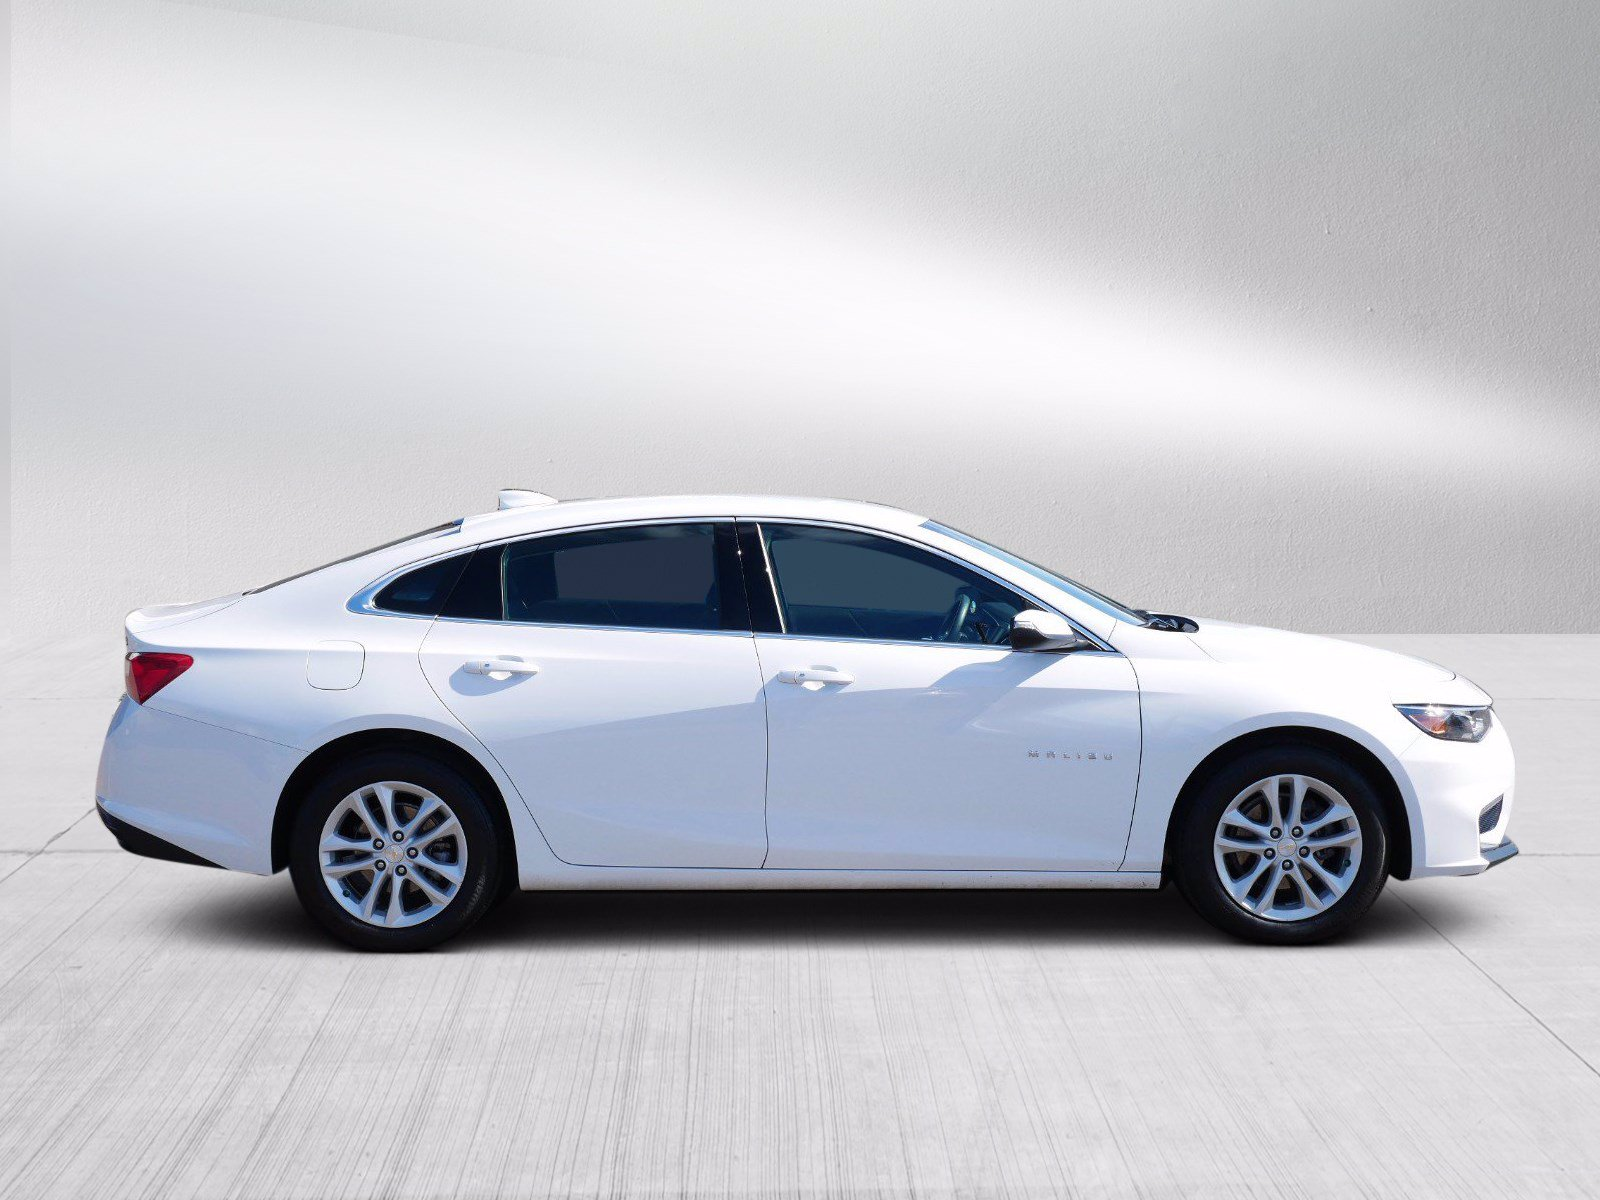 Used 2016 Chevrolet Malibu Hybrid with VIN 1G1ZJ5SU6GF300952 for sale in Bloomington, Minnesota